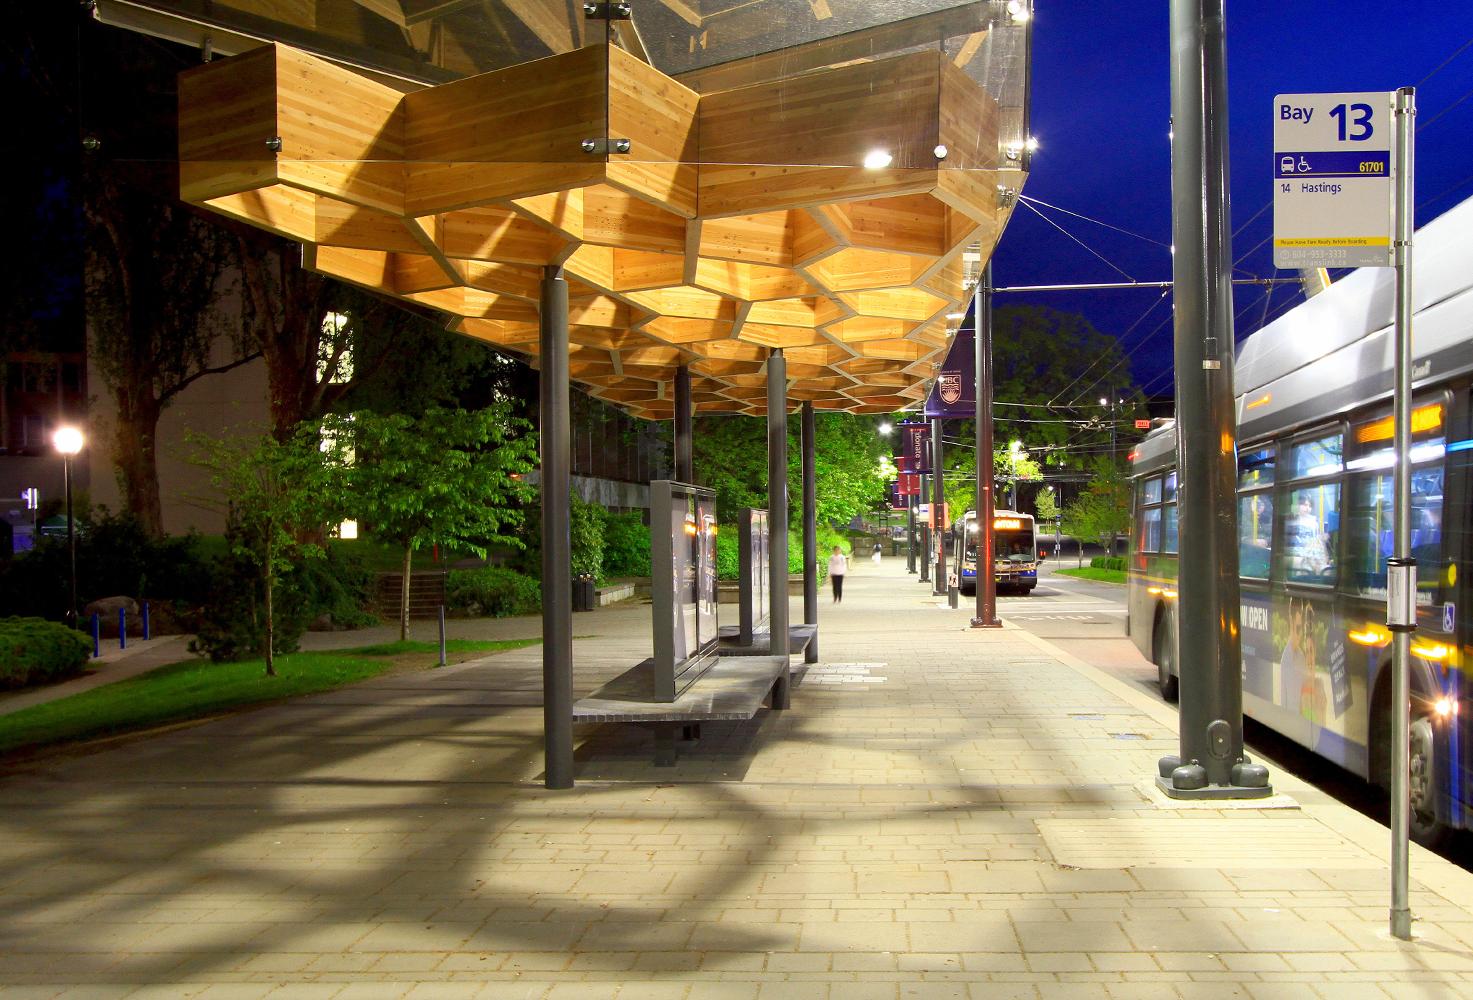 UBC-BUS_SHELTER-08.jpg